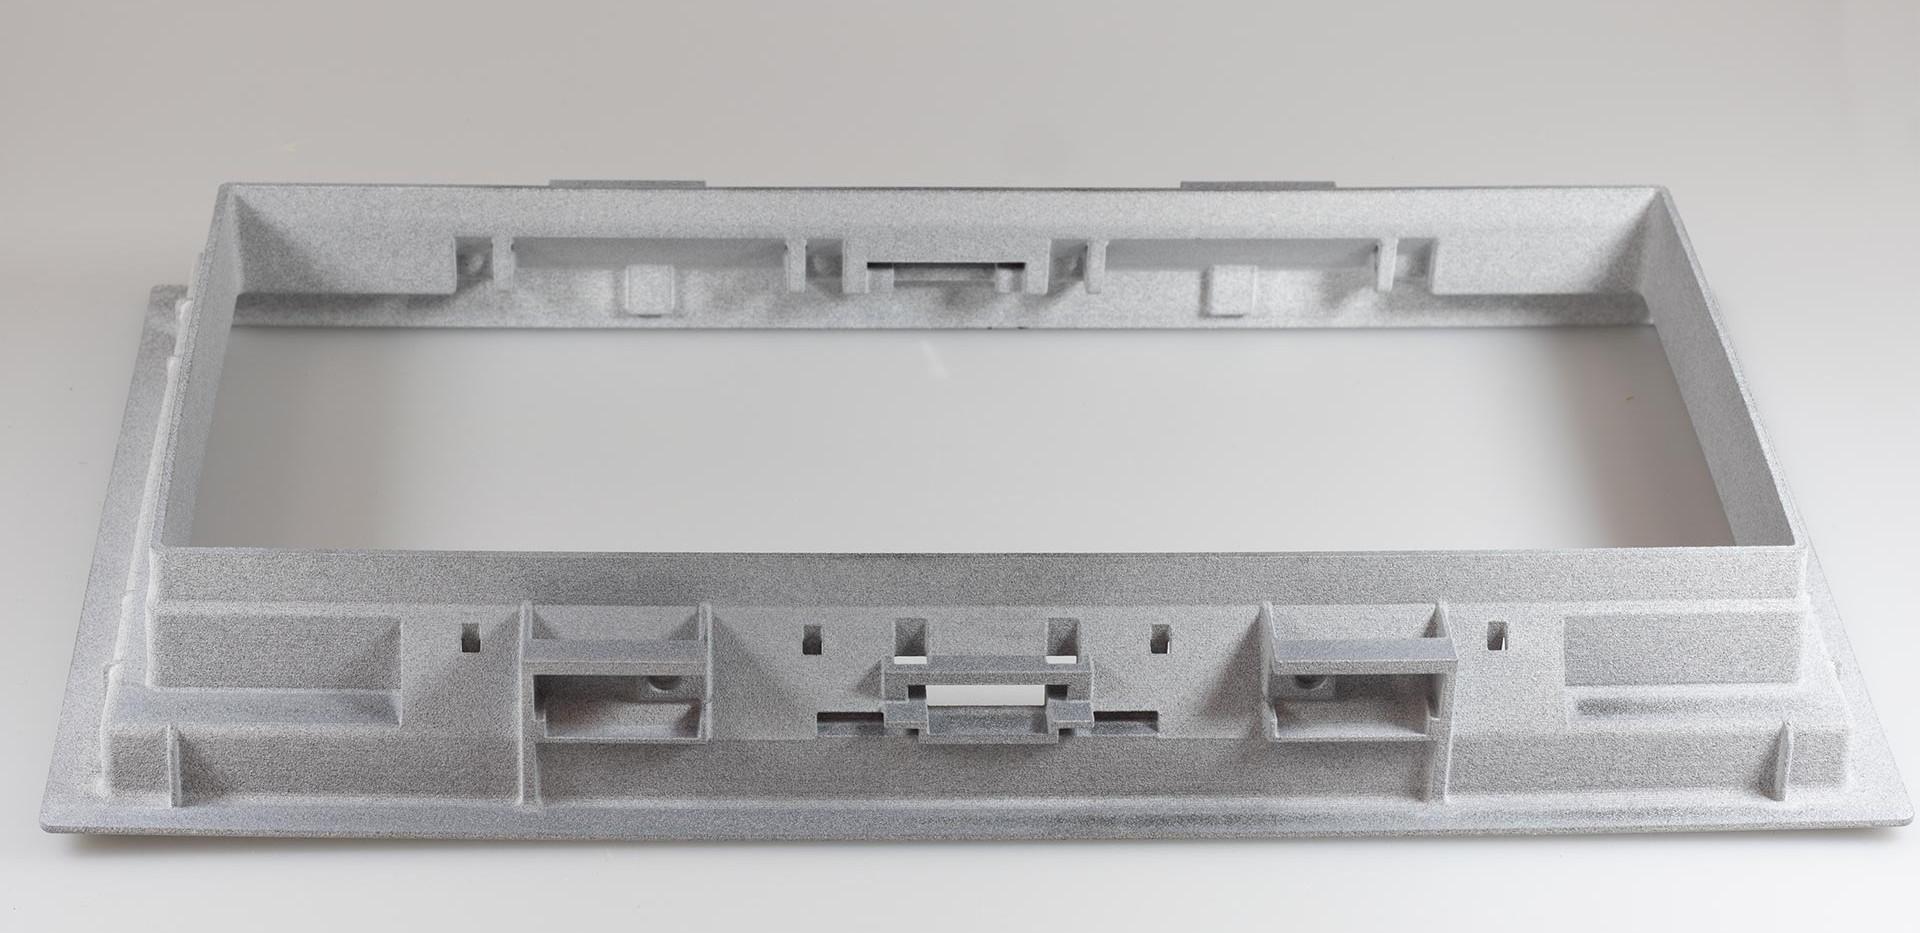 mjf 3d printing frame PA 12